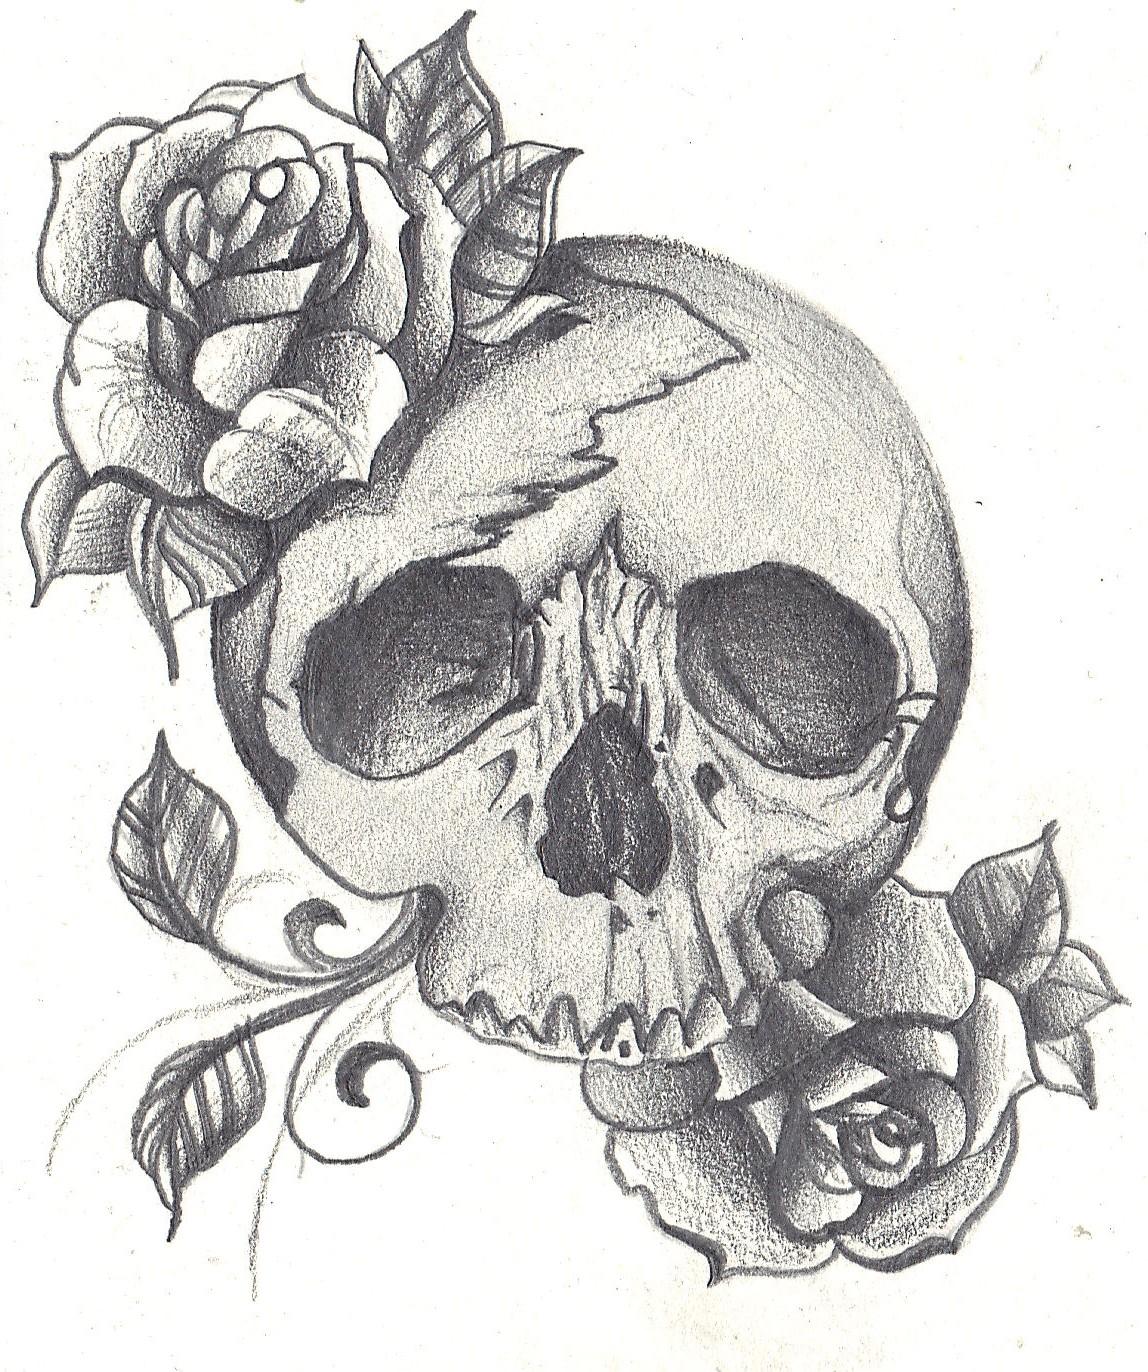 Drawn rose shaded White Shaded Drawing And dongetrabi: